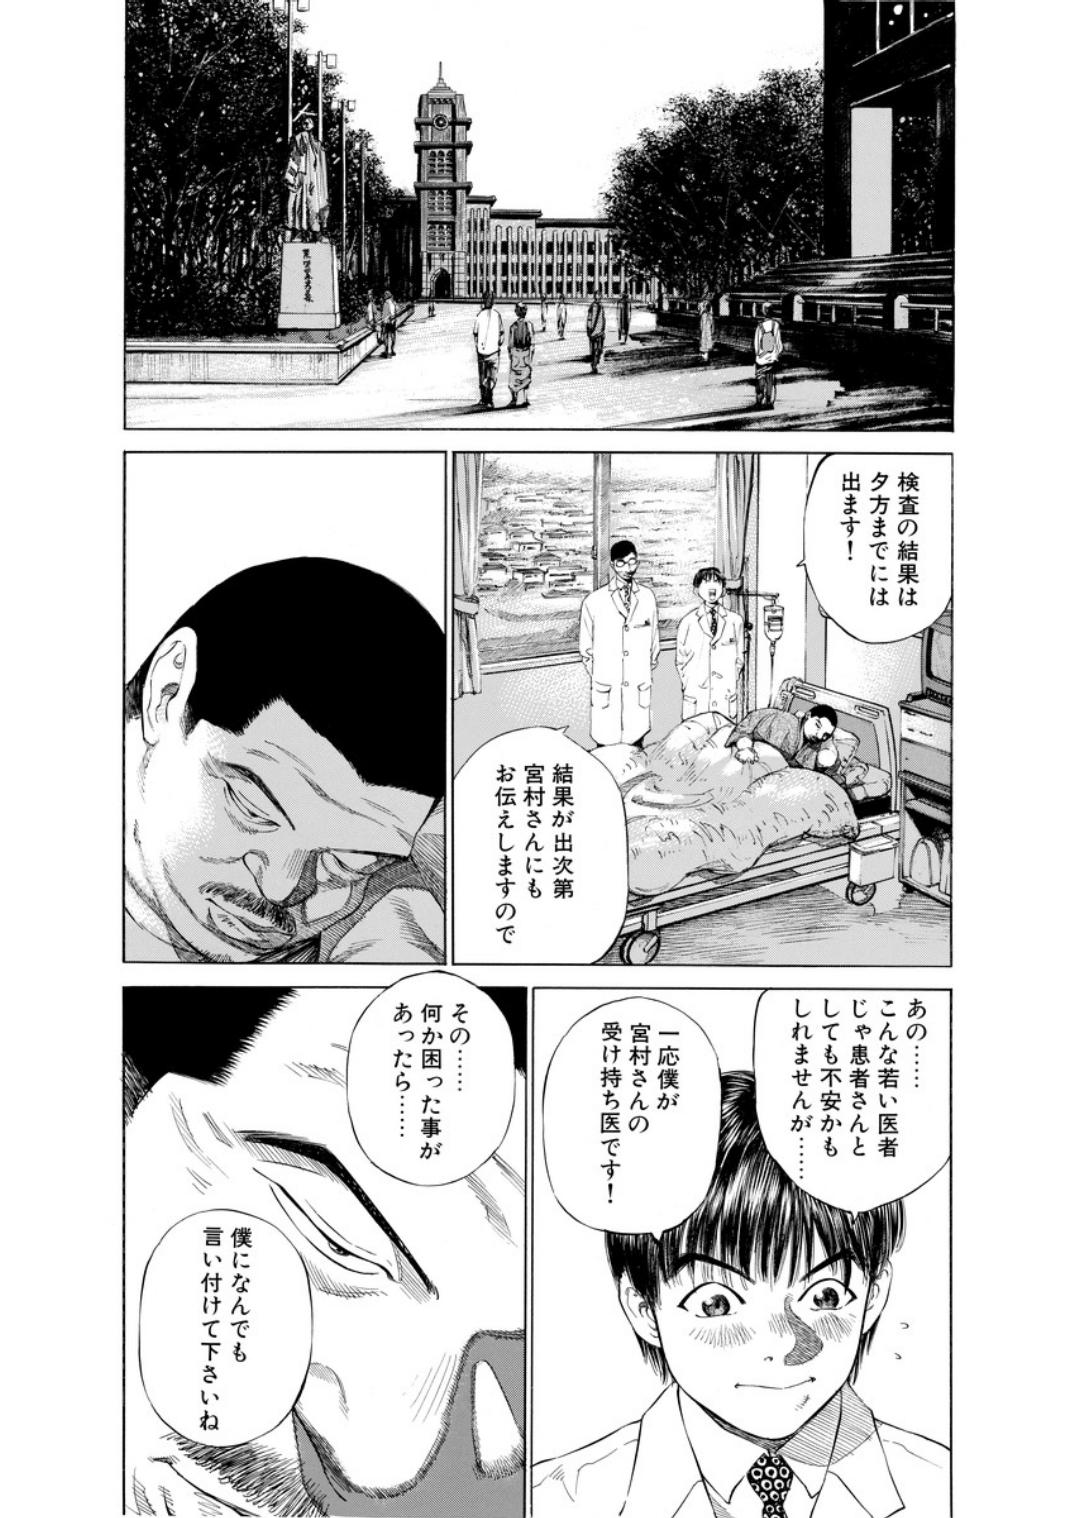 001bj_page-0169.jpg